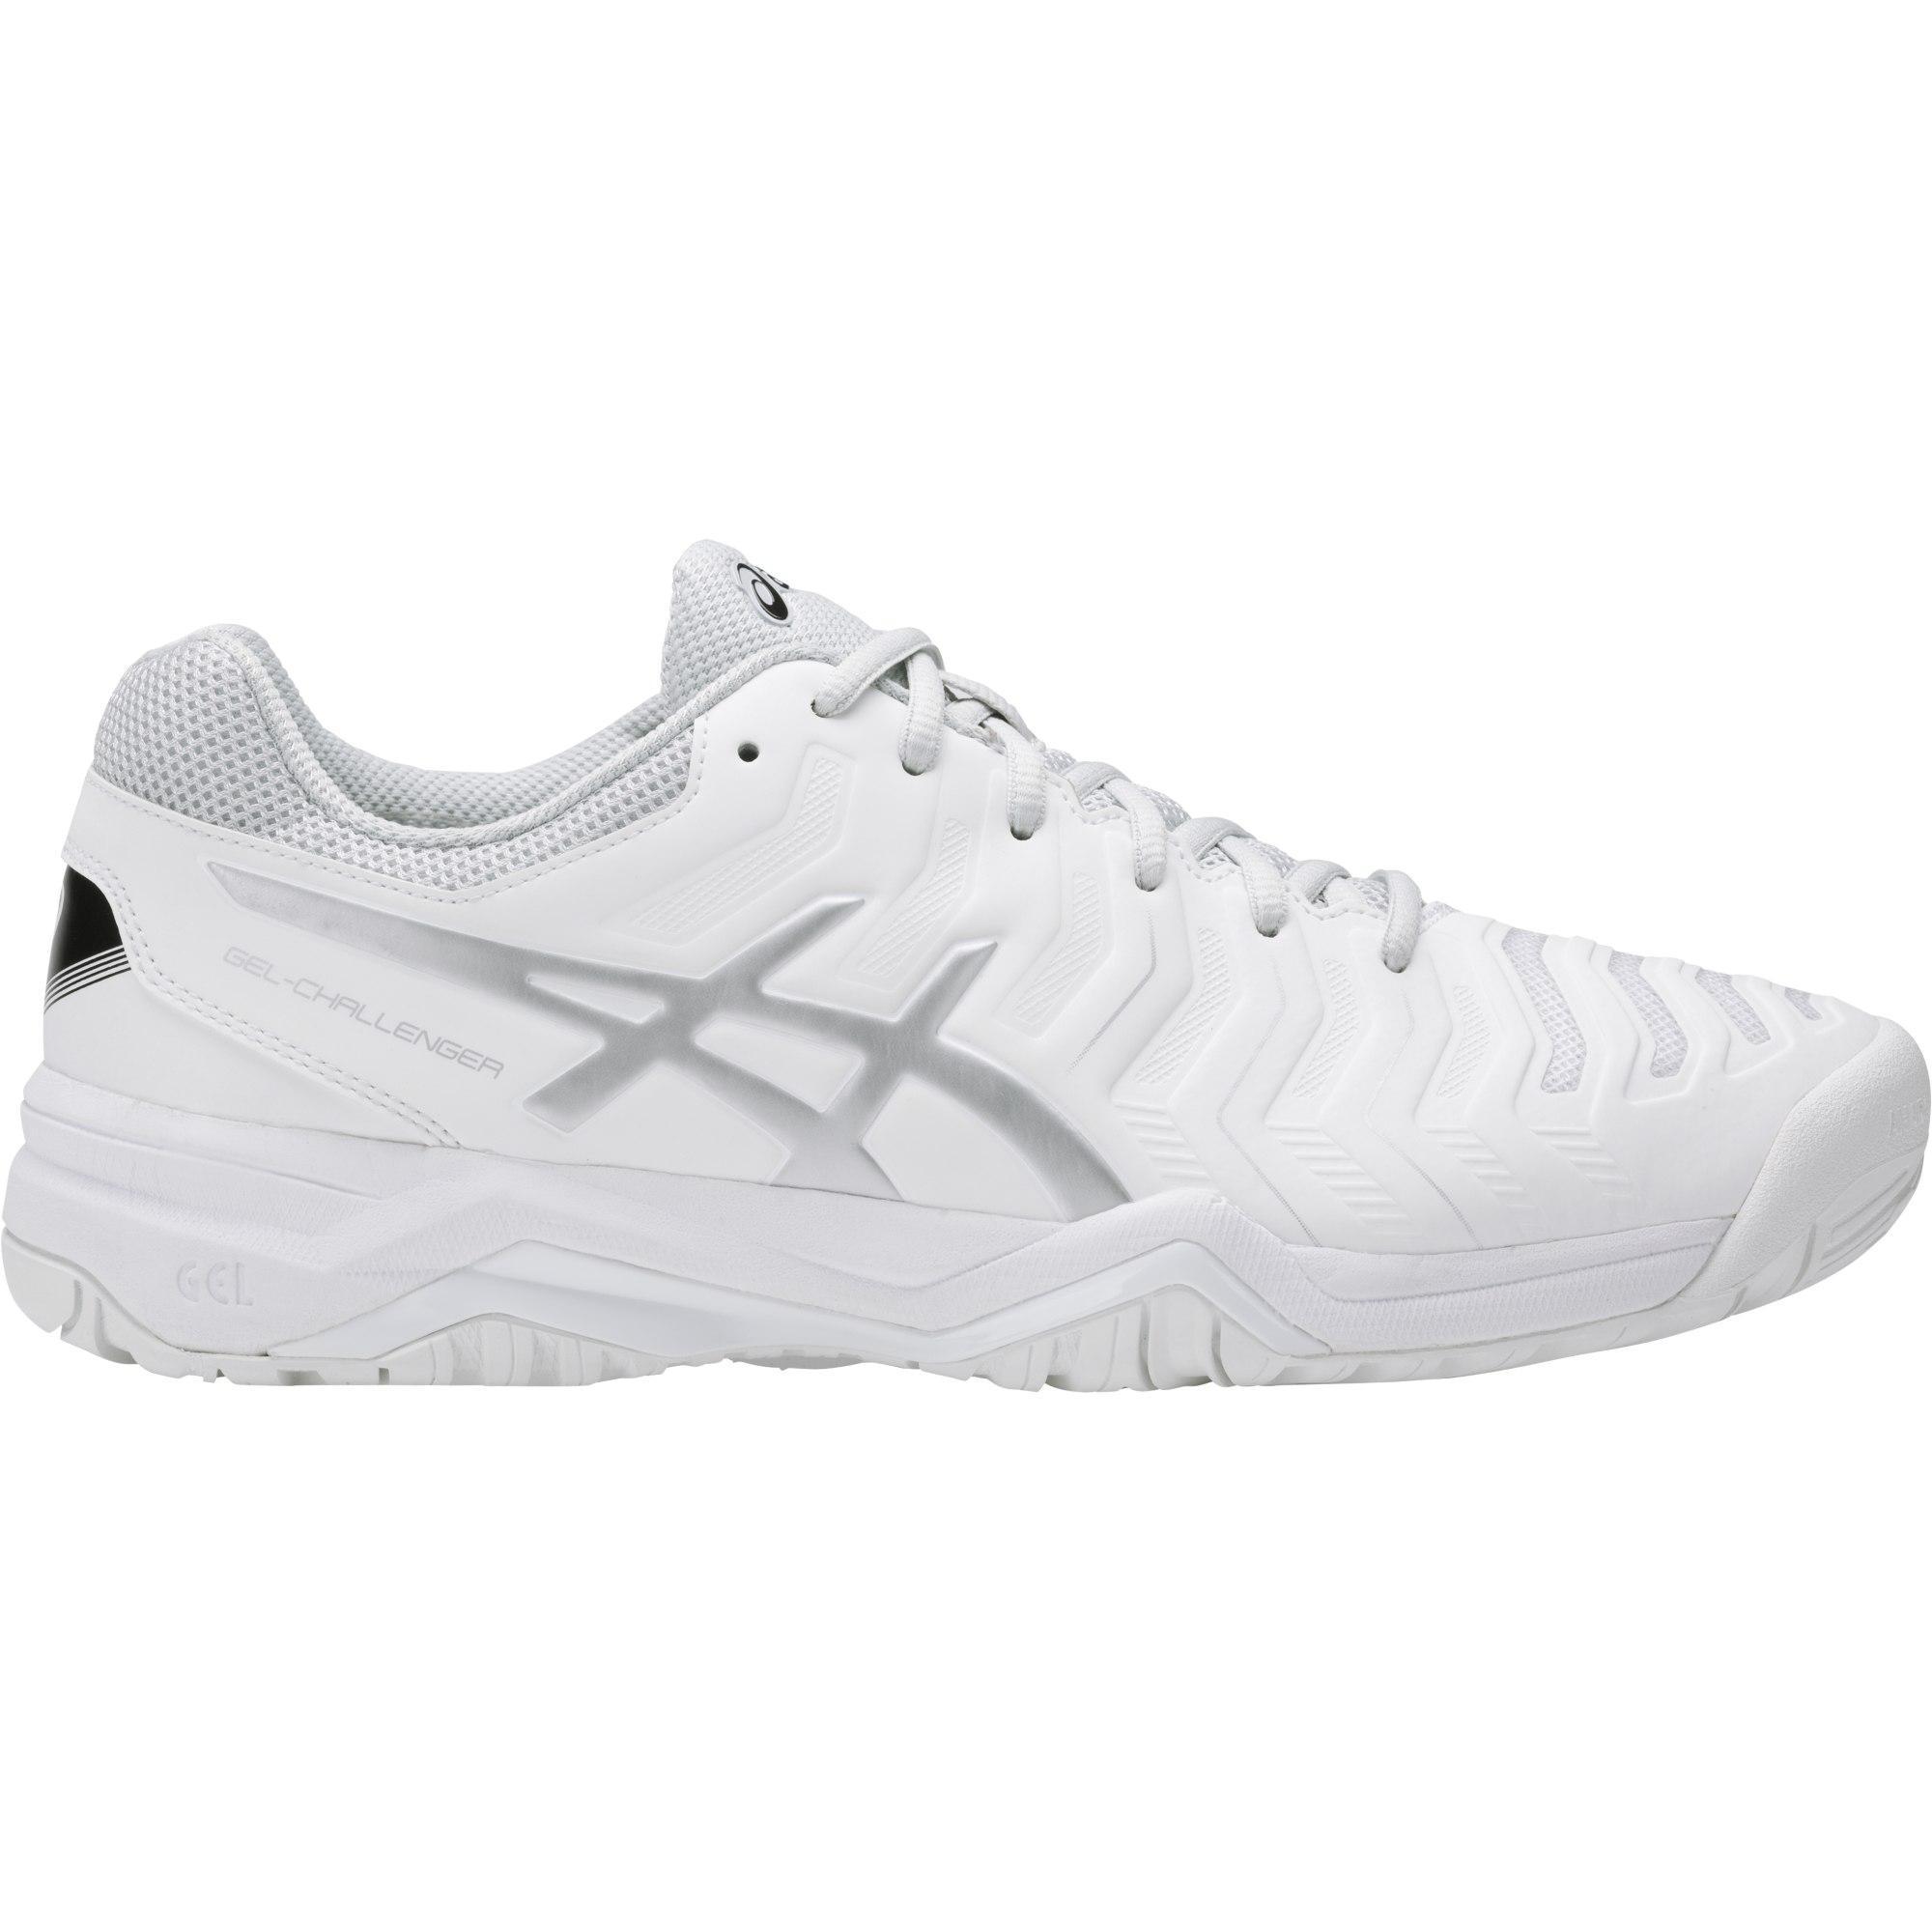 buy popular d35fb 0b60b Asics Mens GEL-Challenger 11 Tennis Shoes - White Silver - Tennisnuts.com